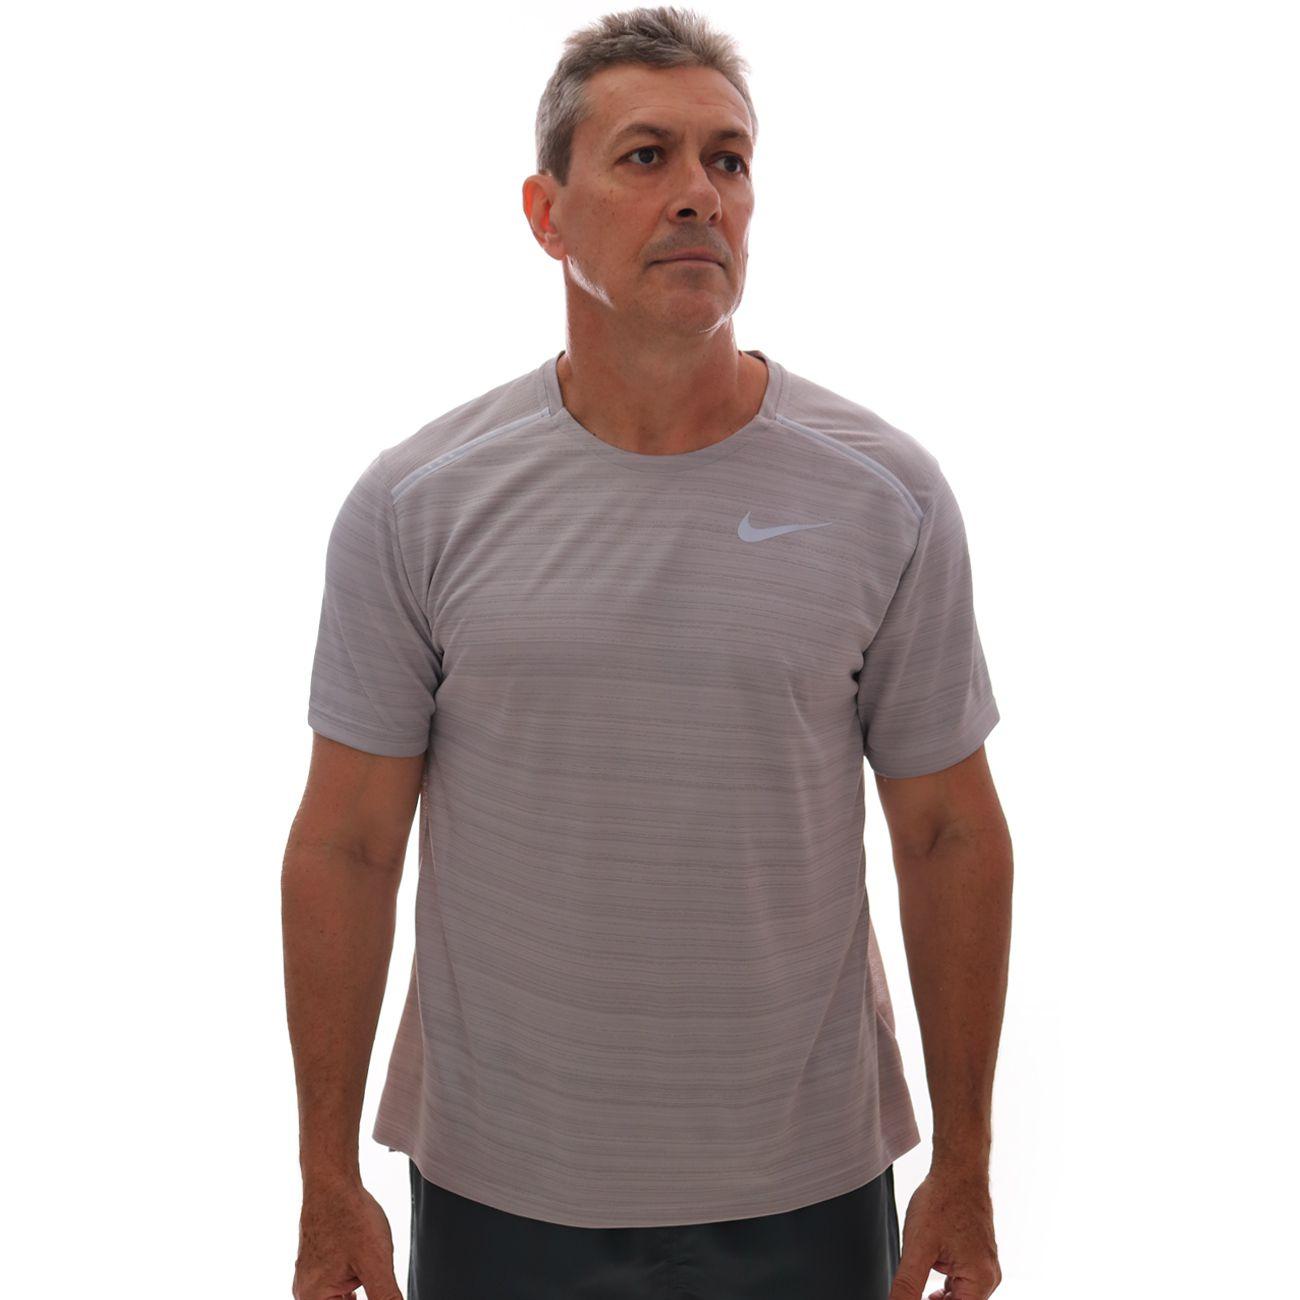 Camiseta Nike Dri-FIT Miler Cinza